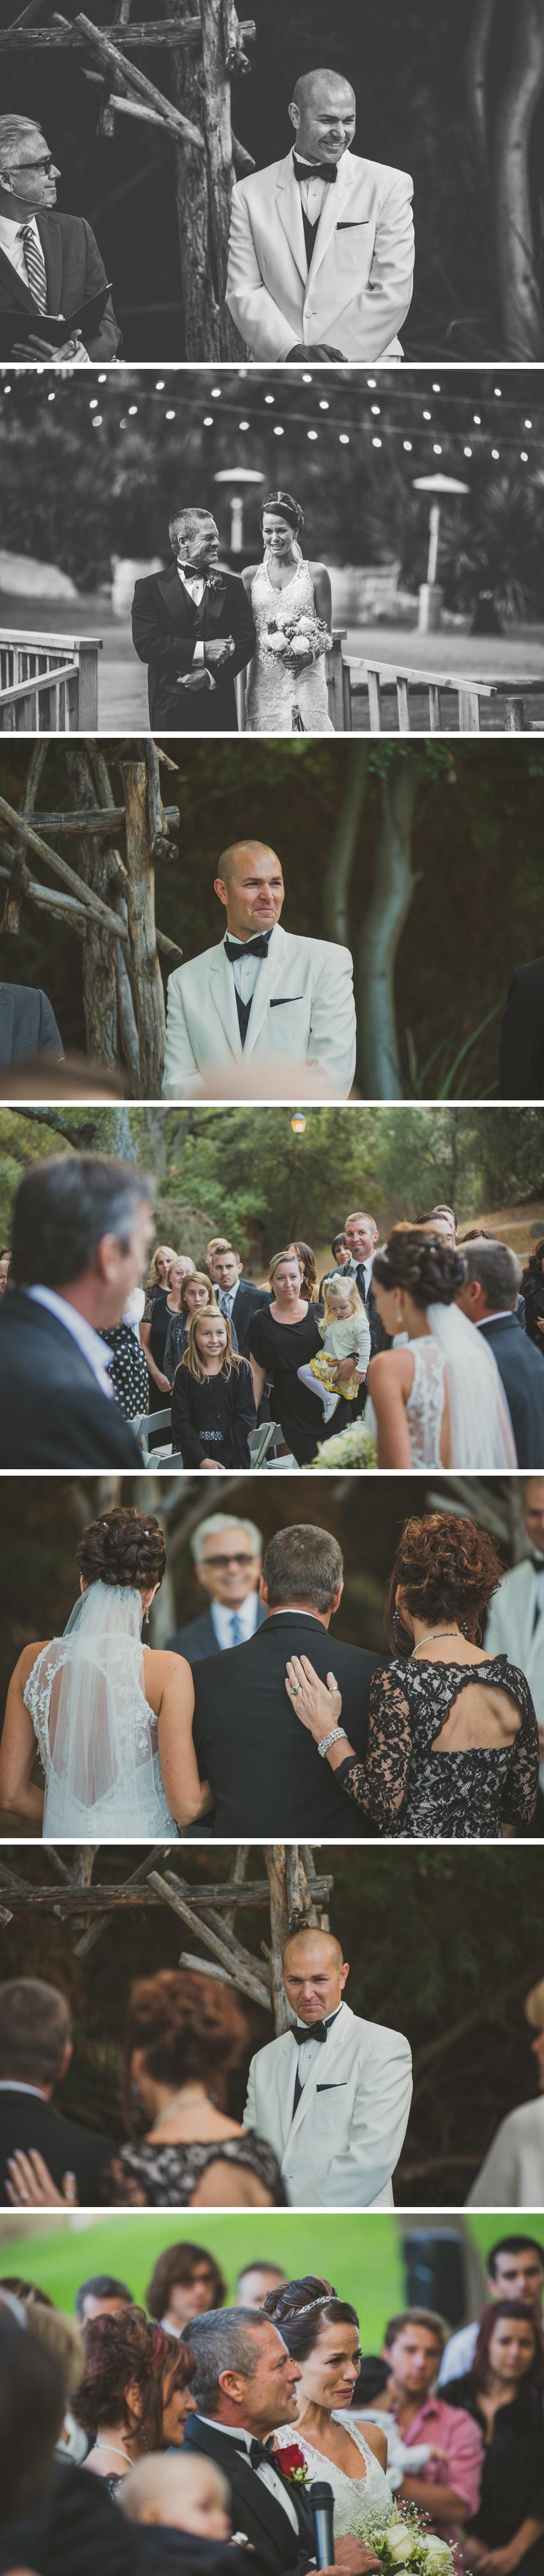 TCI-wedding8